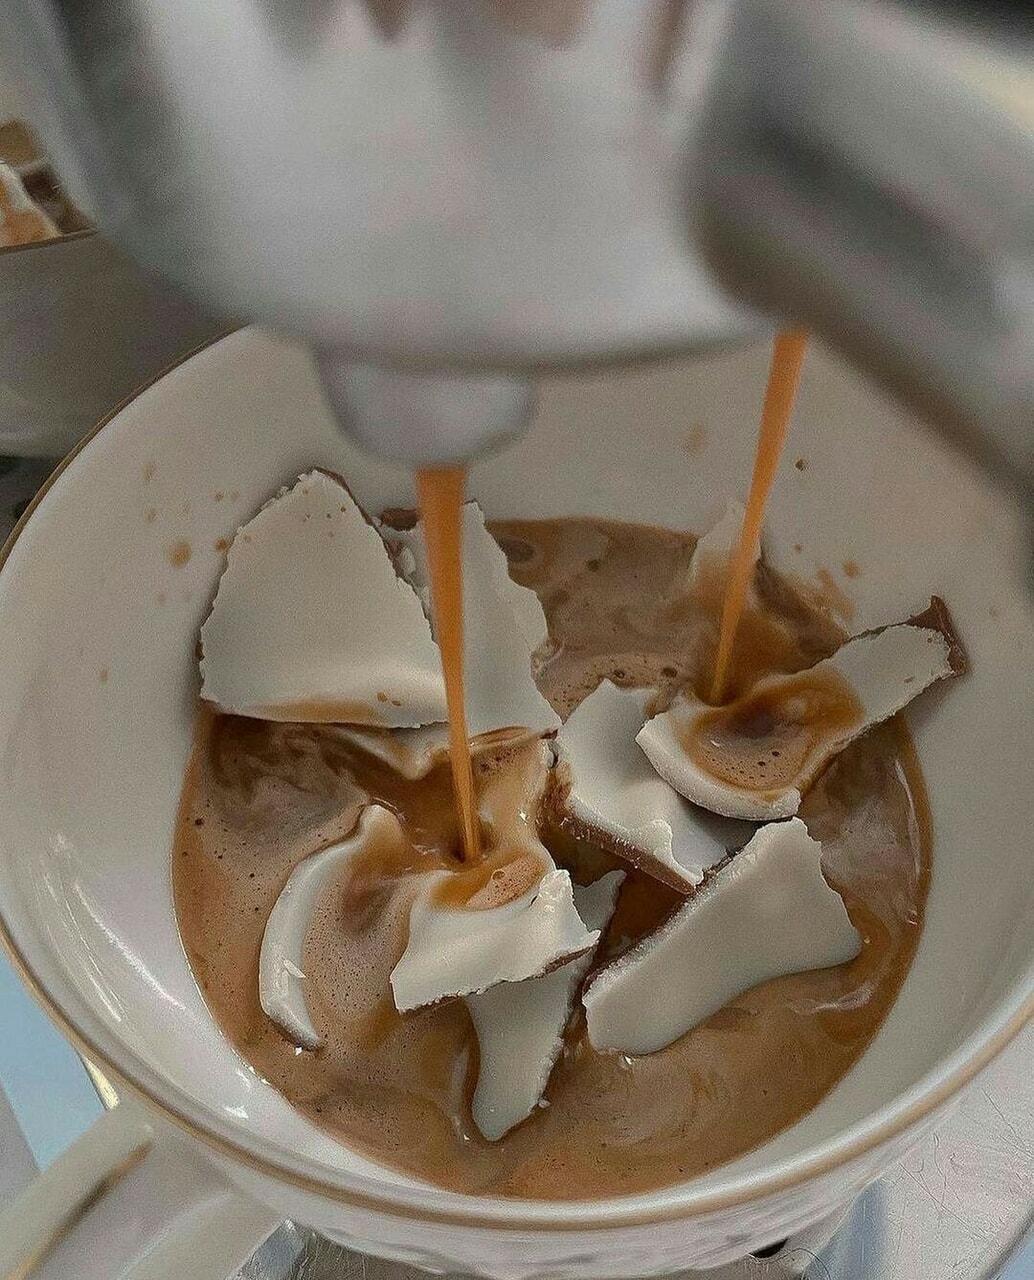 coffee and chocolate image